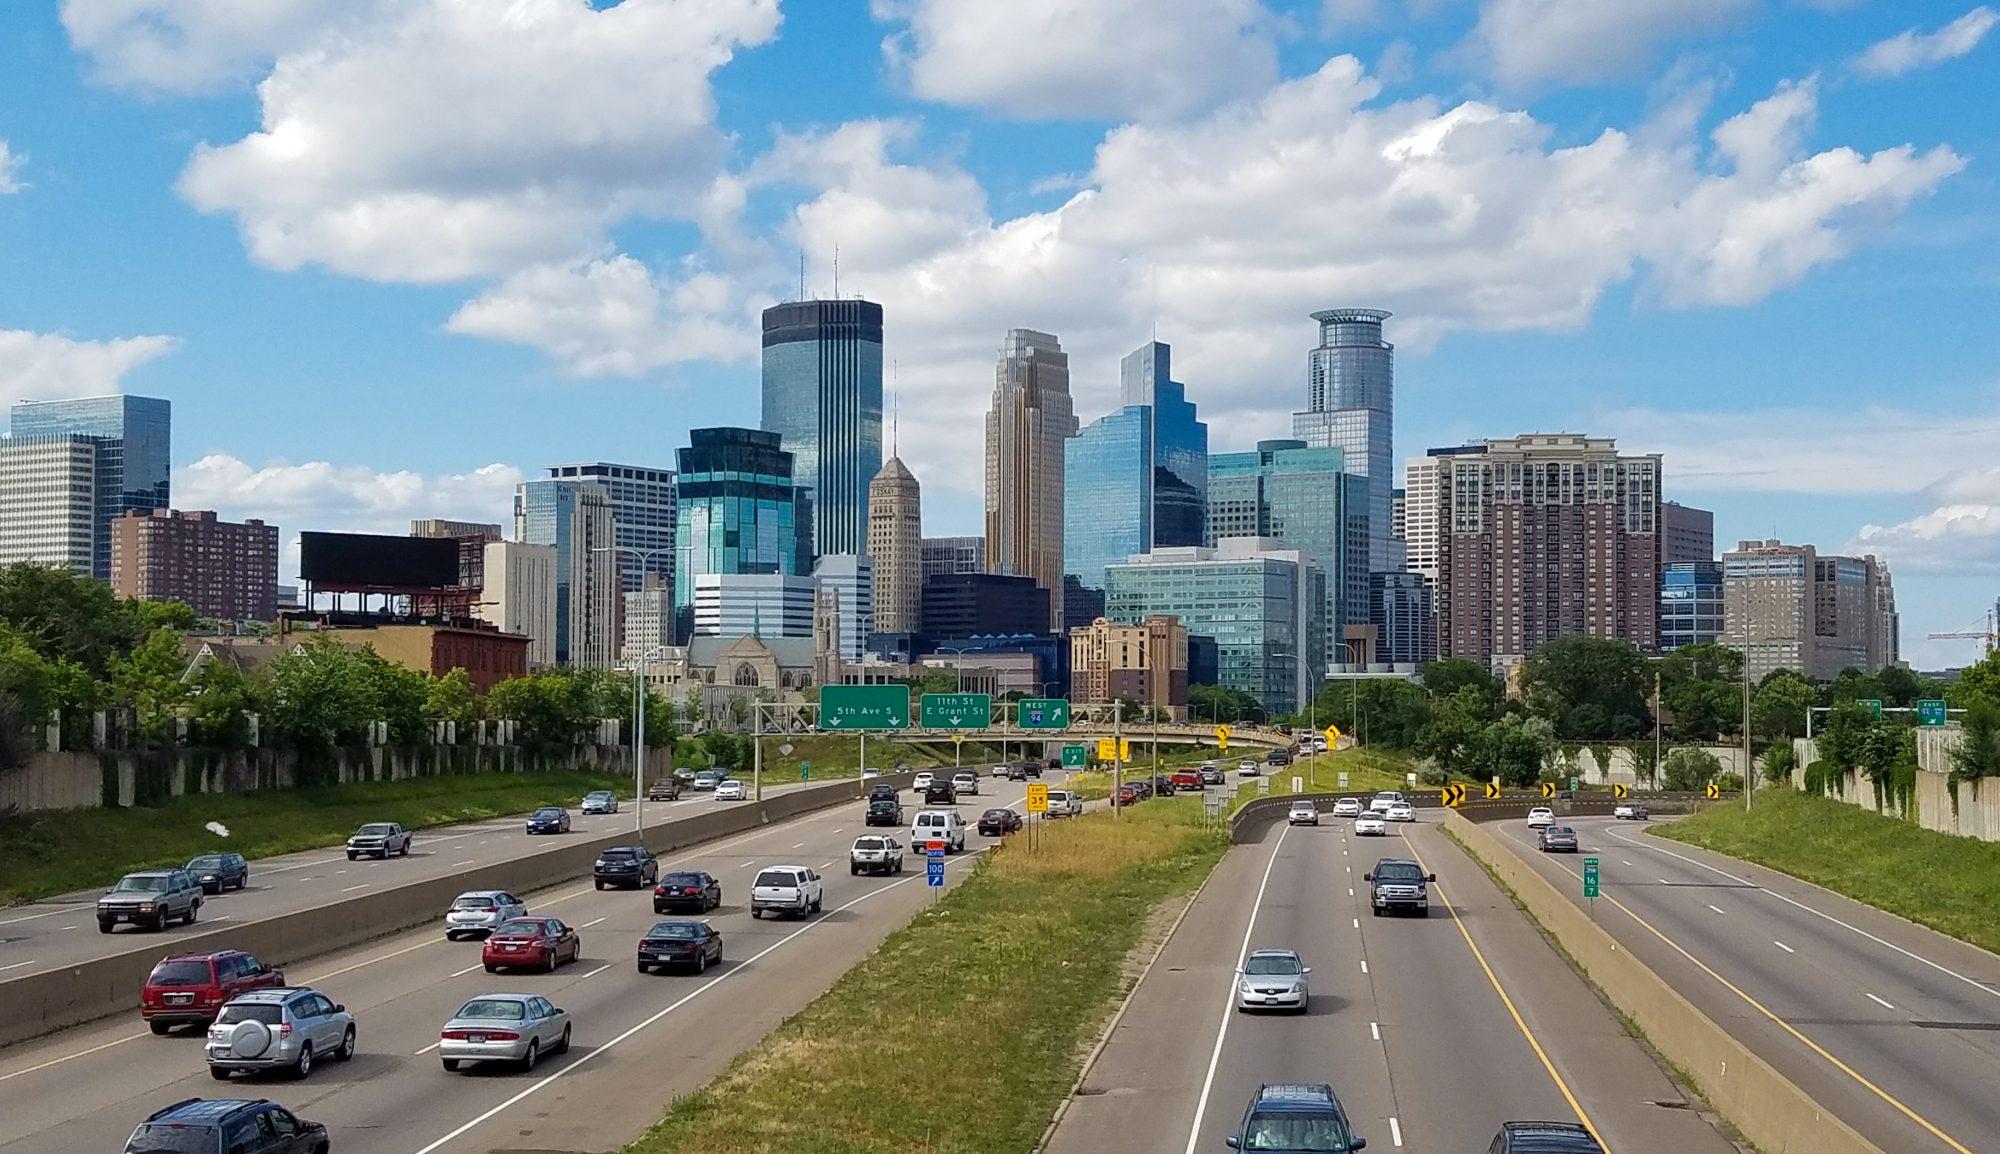 WordCamp Minneapolis/St. Paul